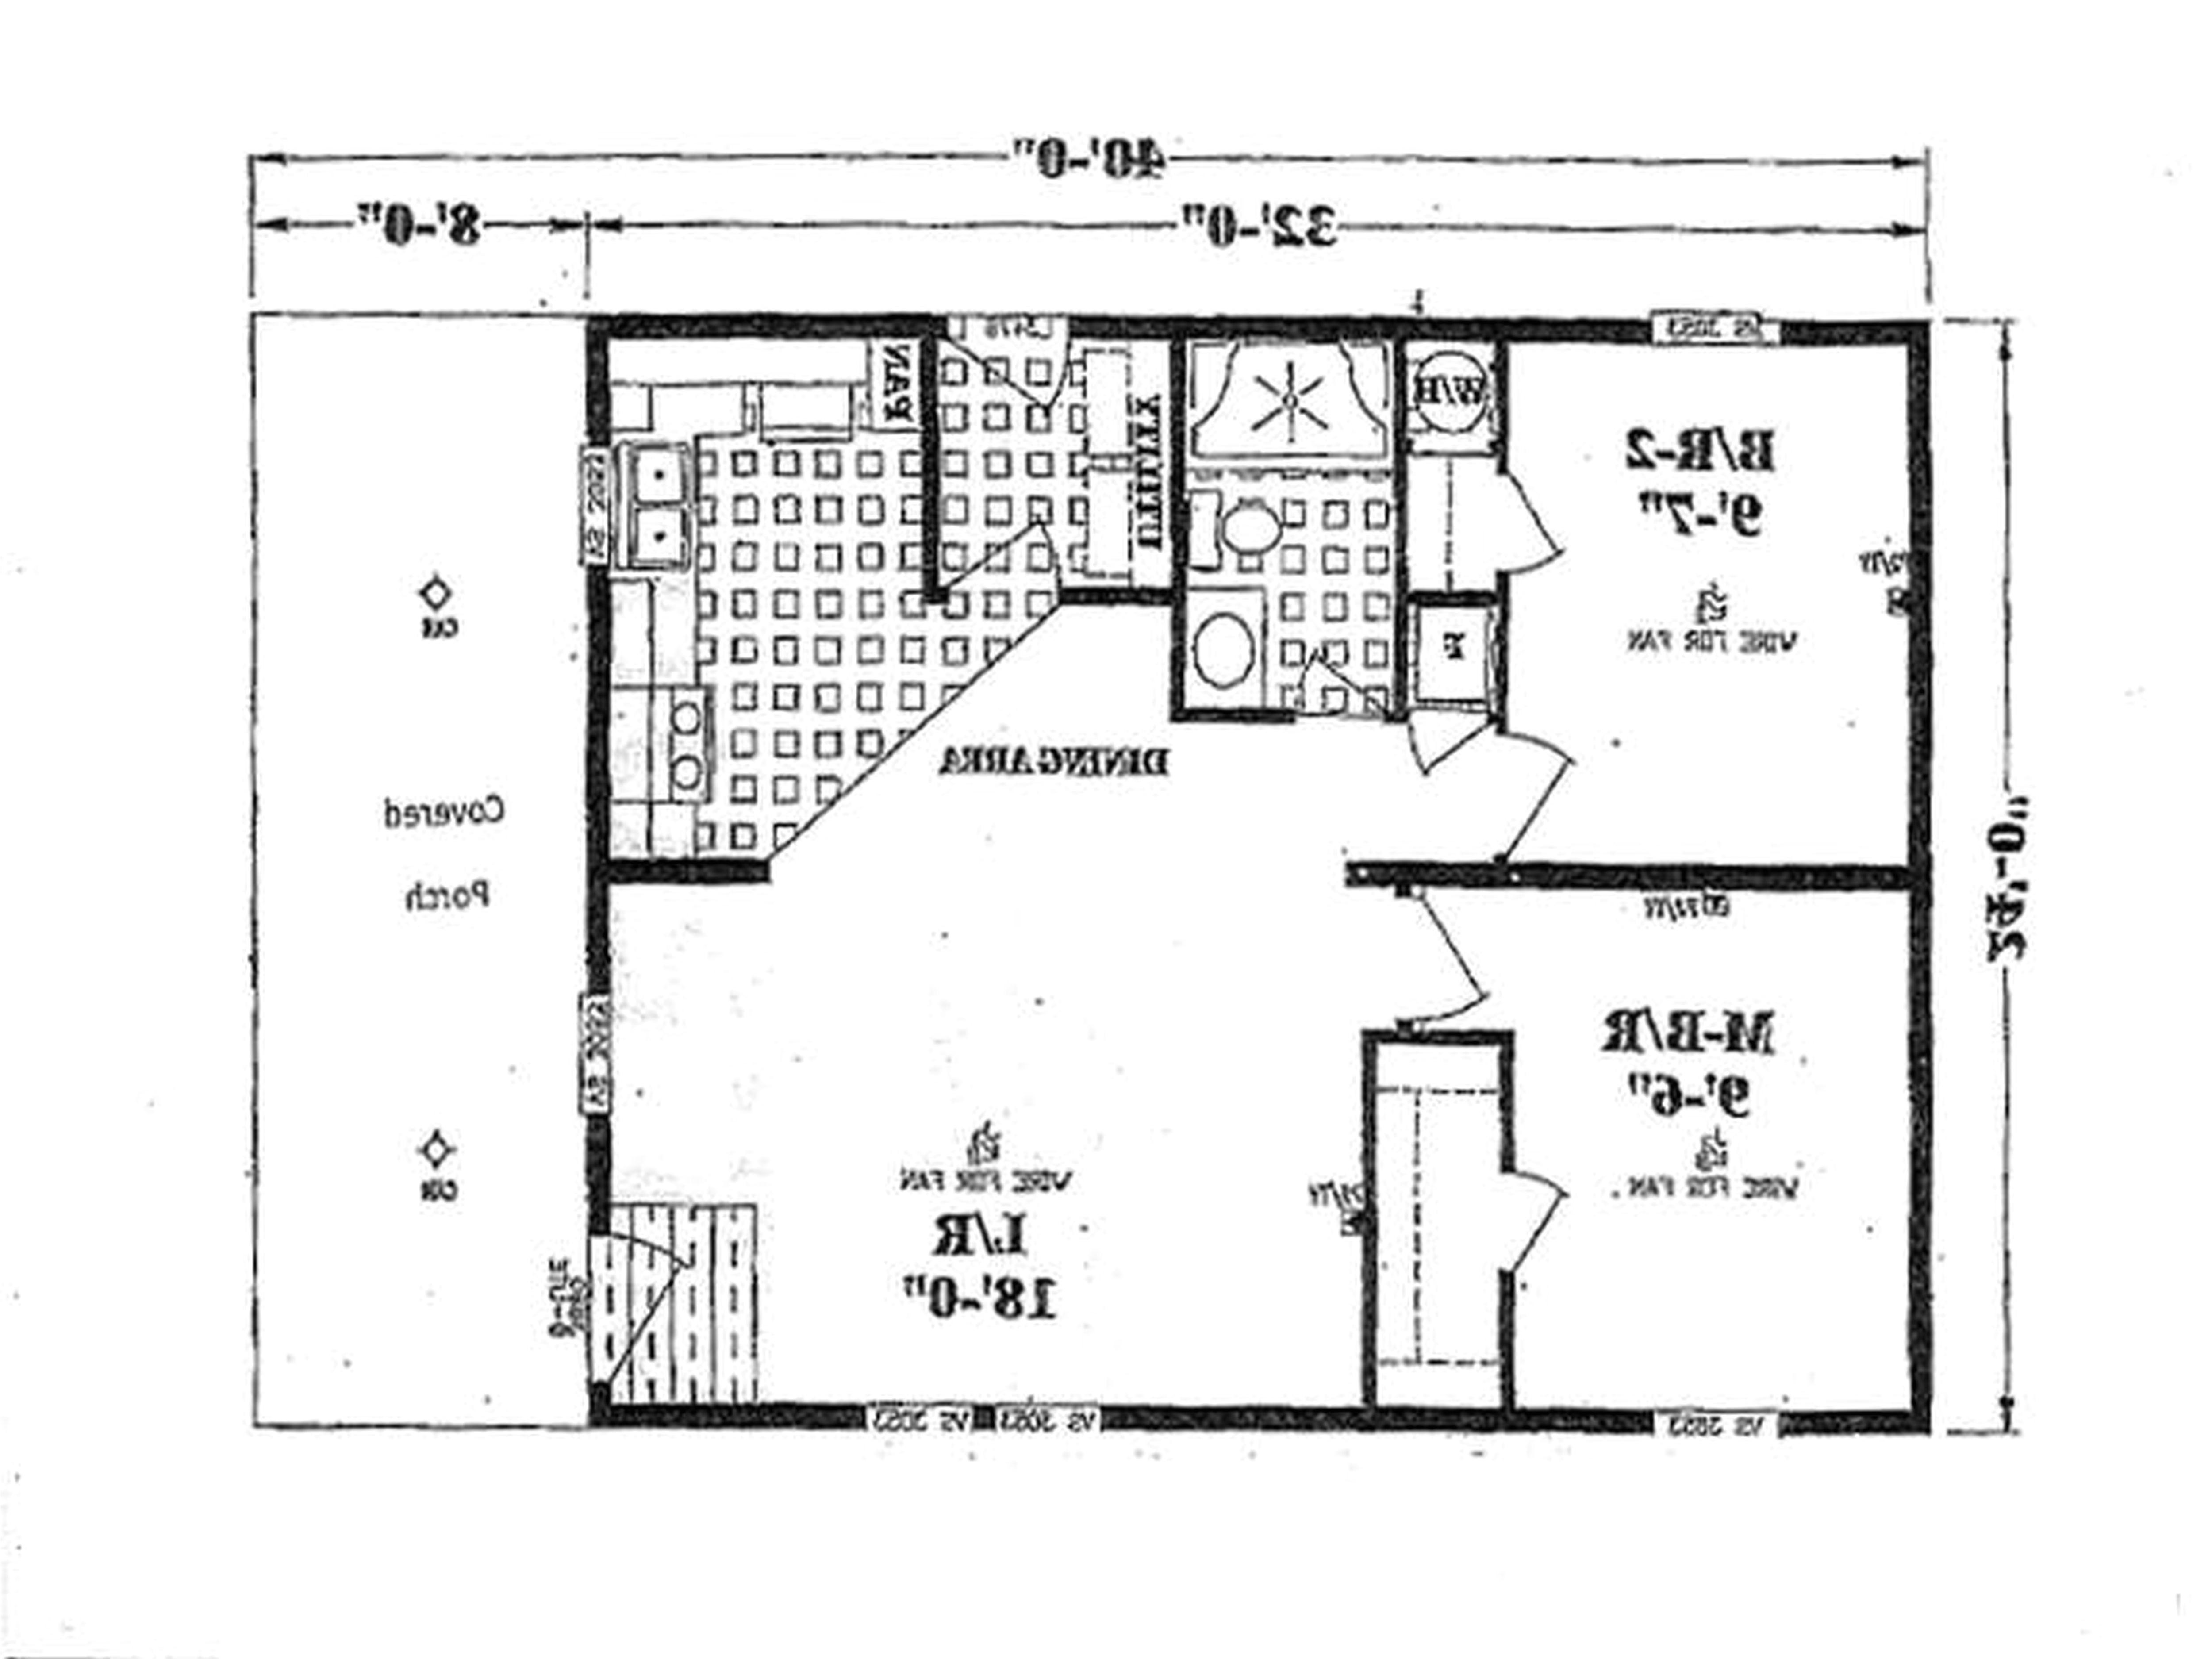 mobile home floor plans under 1000 sq ft